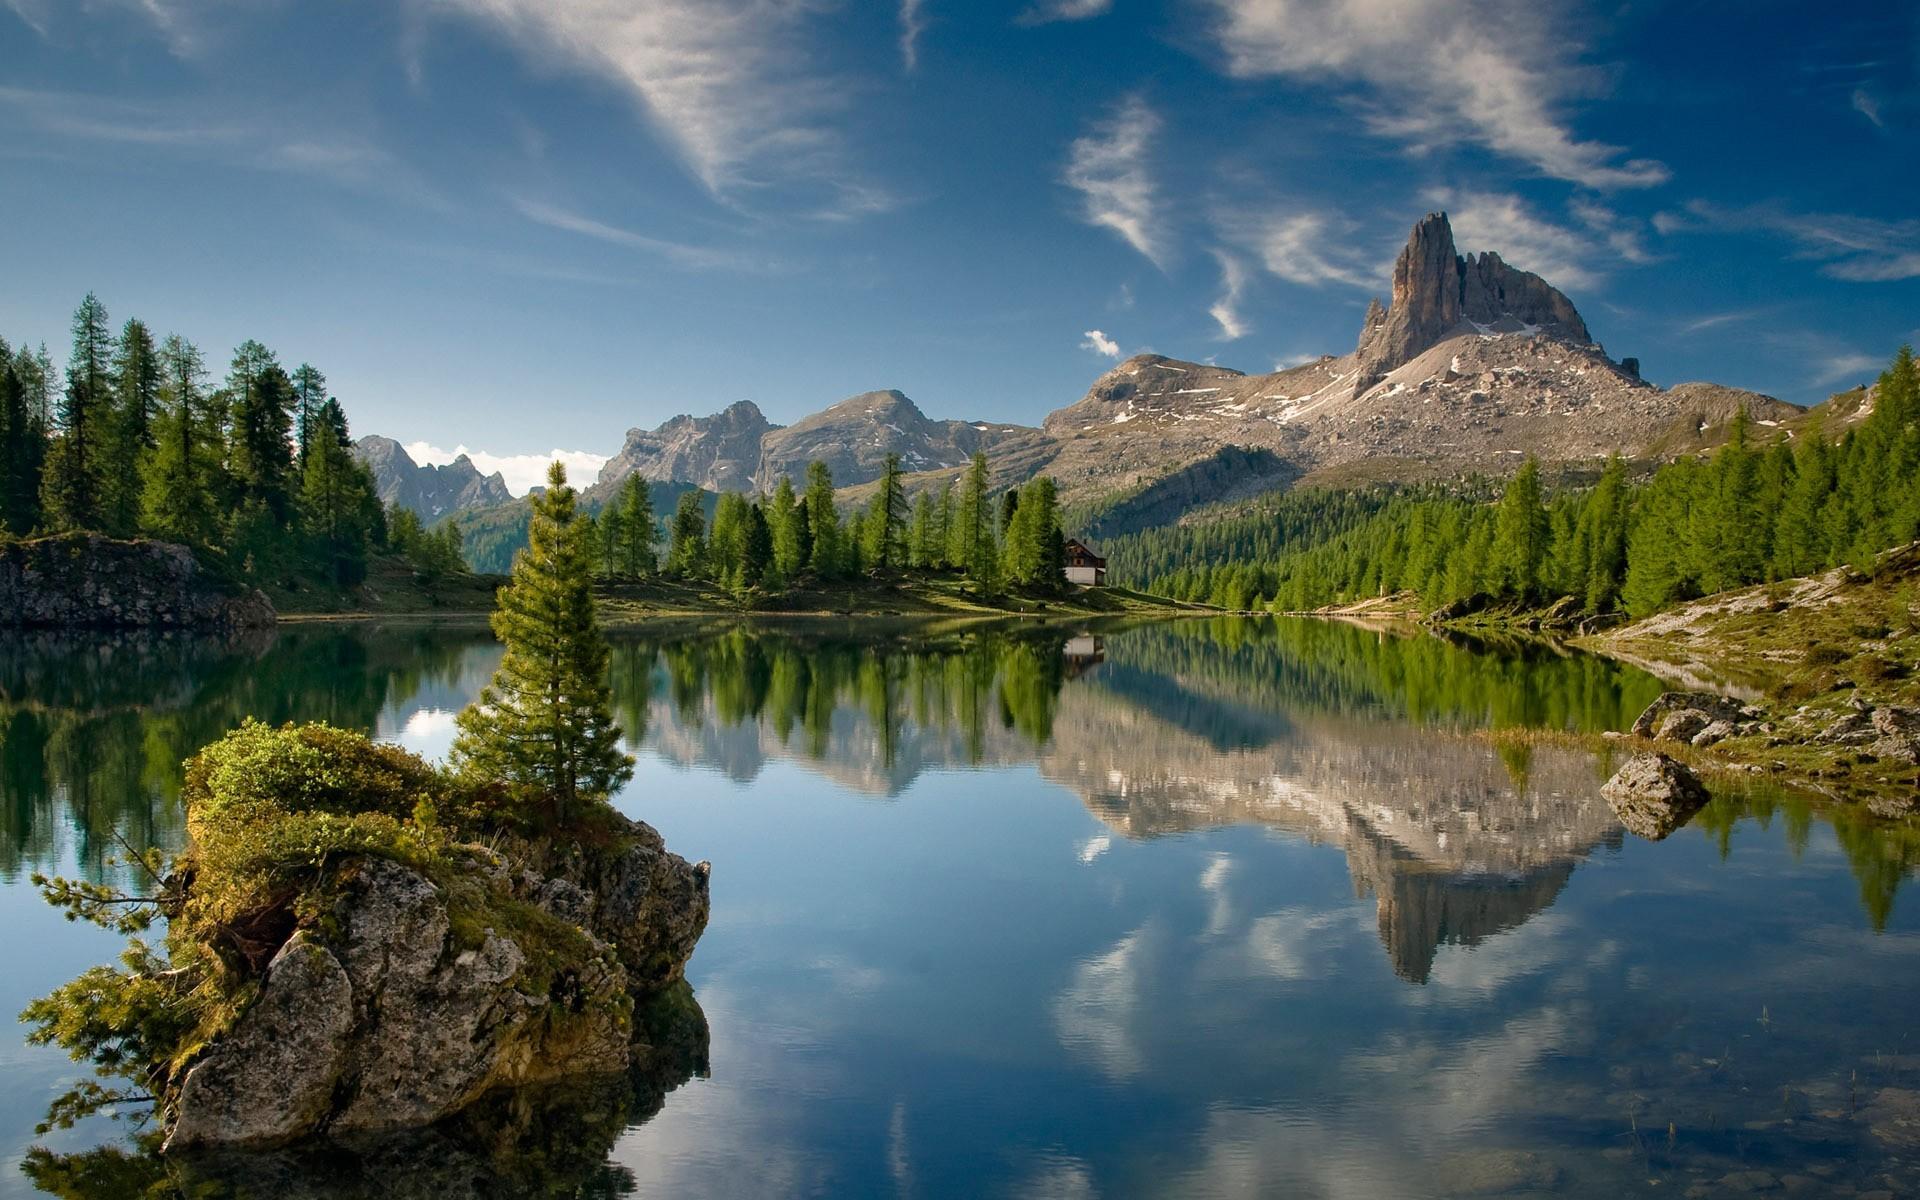 Free Download Fond Ecran Paysage Lac De Montagne Wallpaper